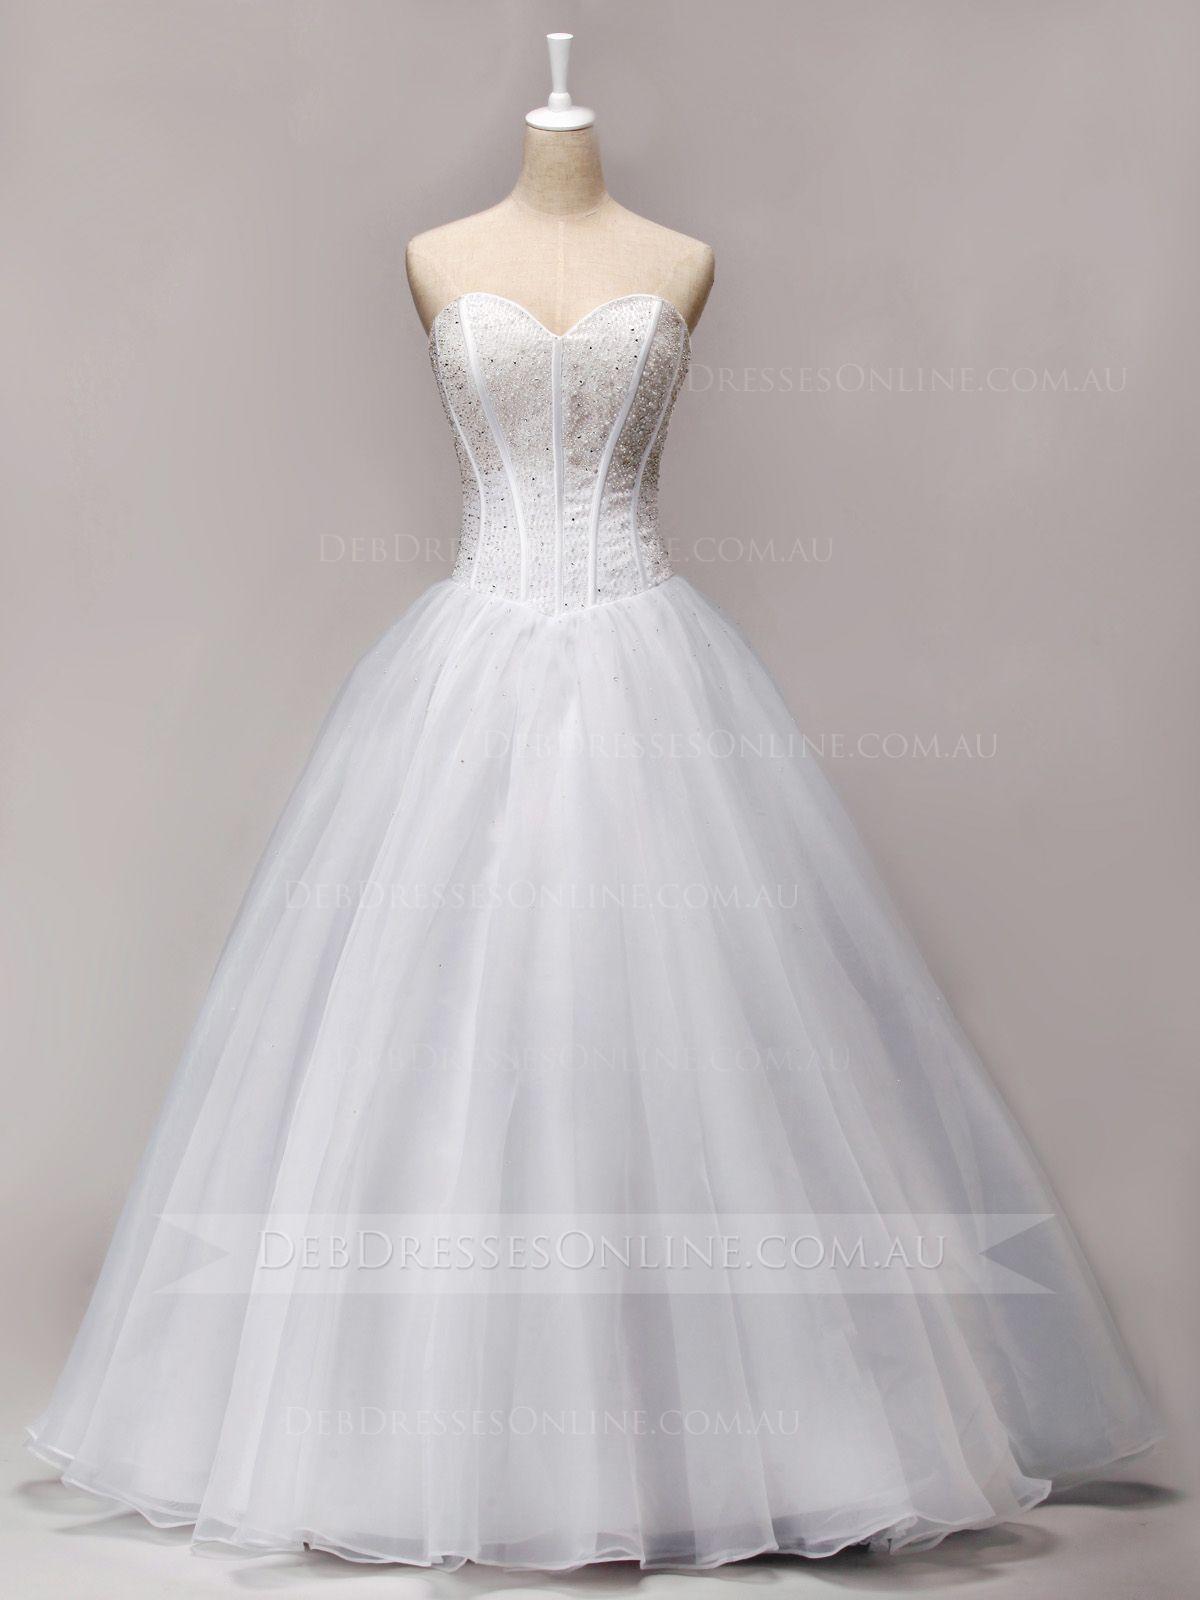 بالصور صور ملابس اعراس , اجمل فساتين الافراح 4951 8